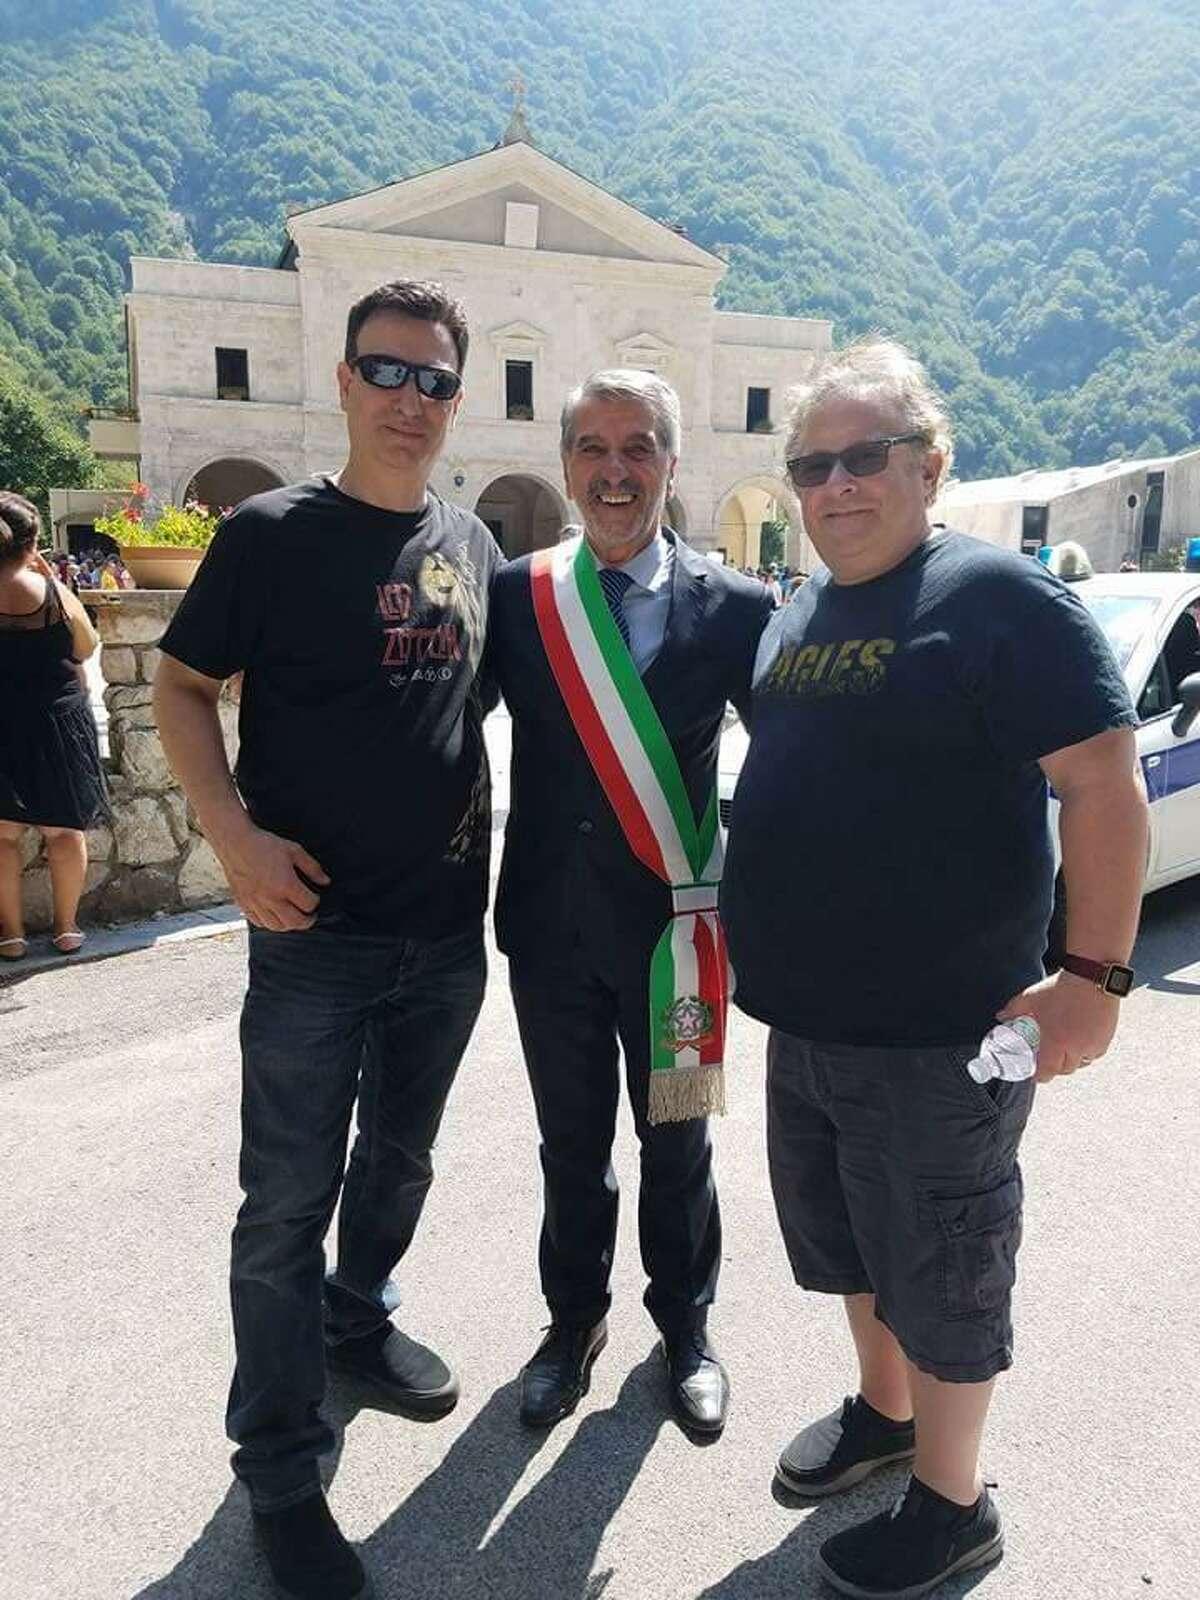 Band members Mario Socci, left, and Allan Tepper, right, pose with the mayor of Settefrati, Riccardo Frattaroli, center.